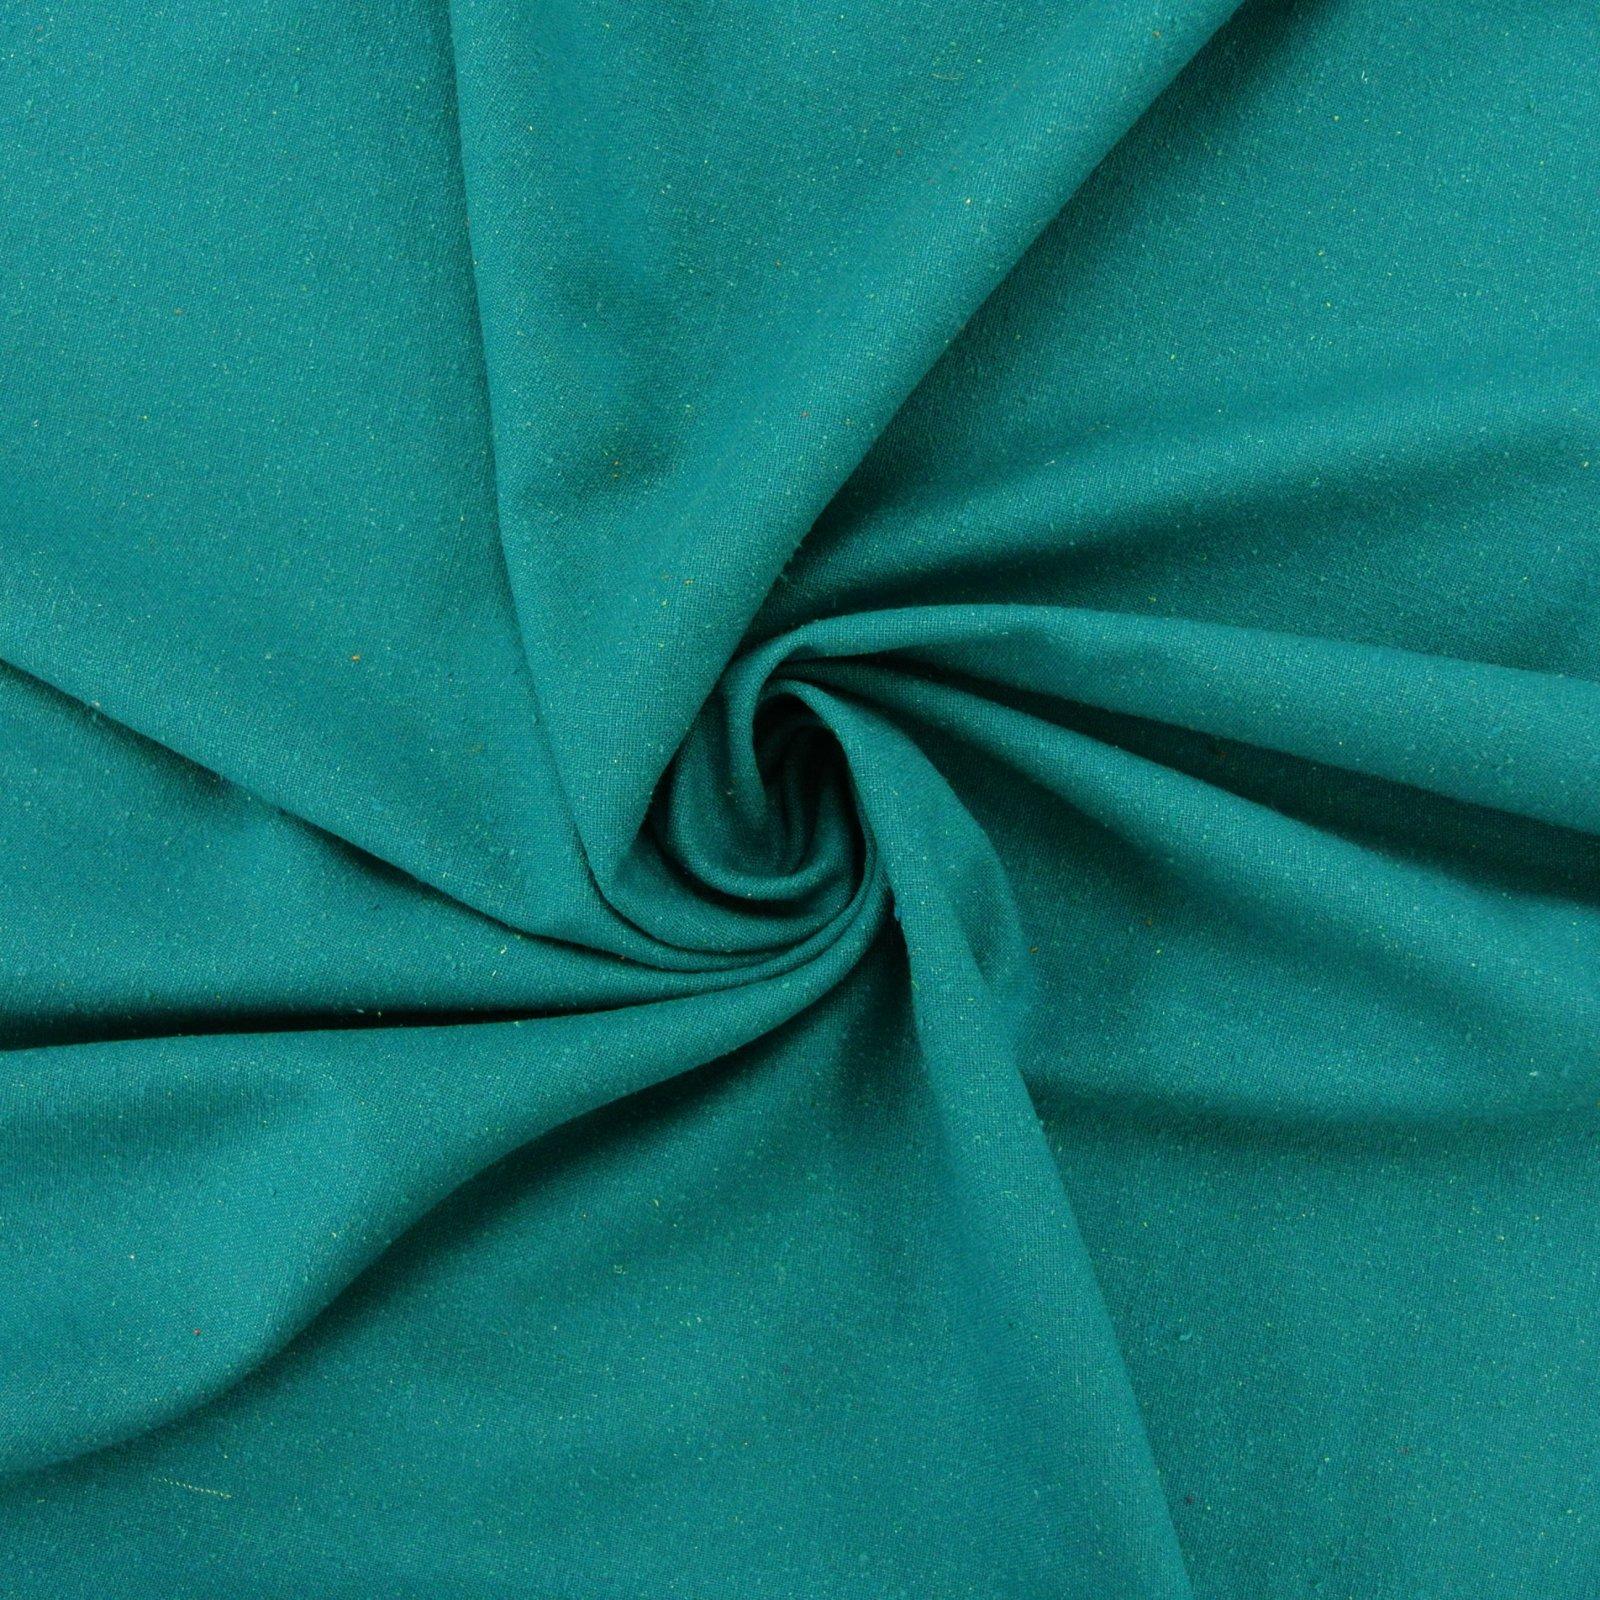 Silk Noil teal